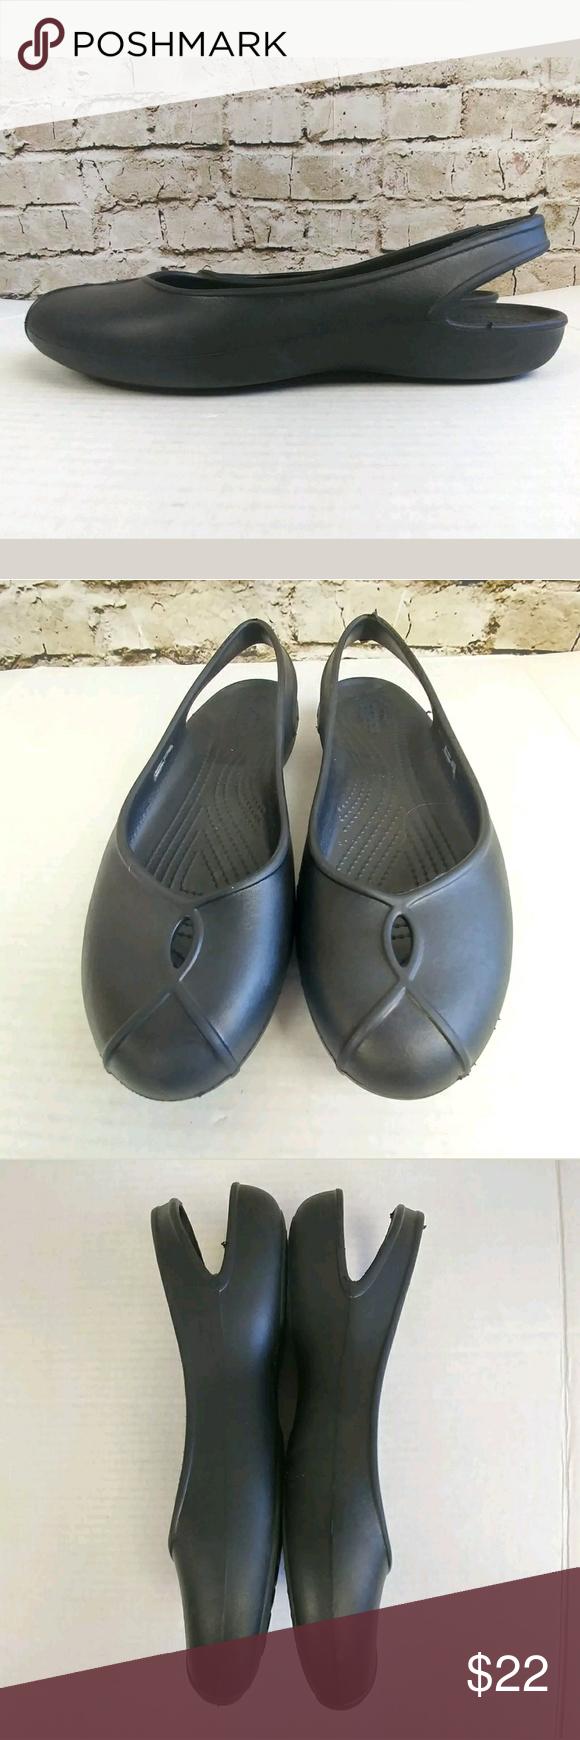 e39fbae6c Authentic Crocs Slingbacks Ballet Flats Sandals Crocs Twist   Keyhole Front  Mary Janes Womens Shoe Size